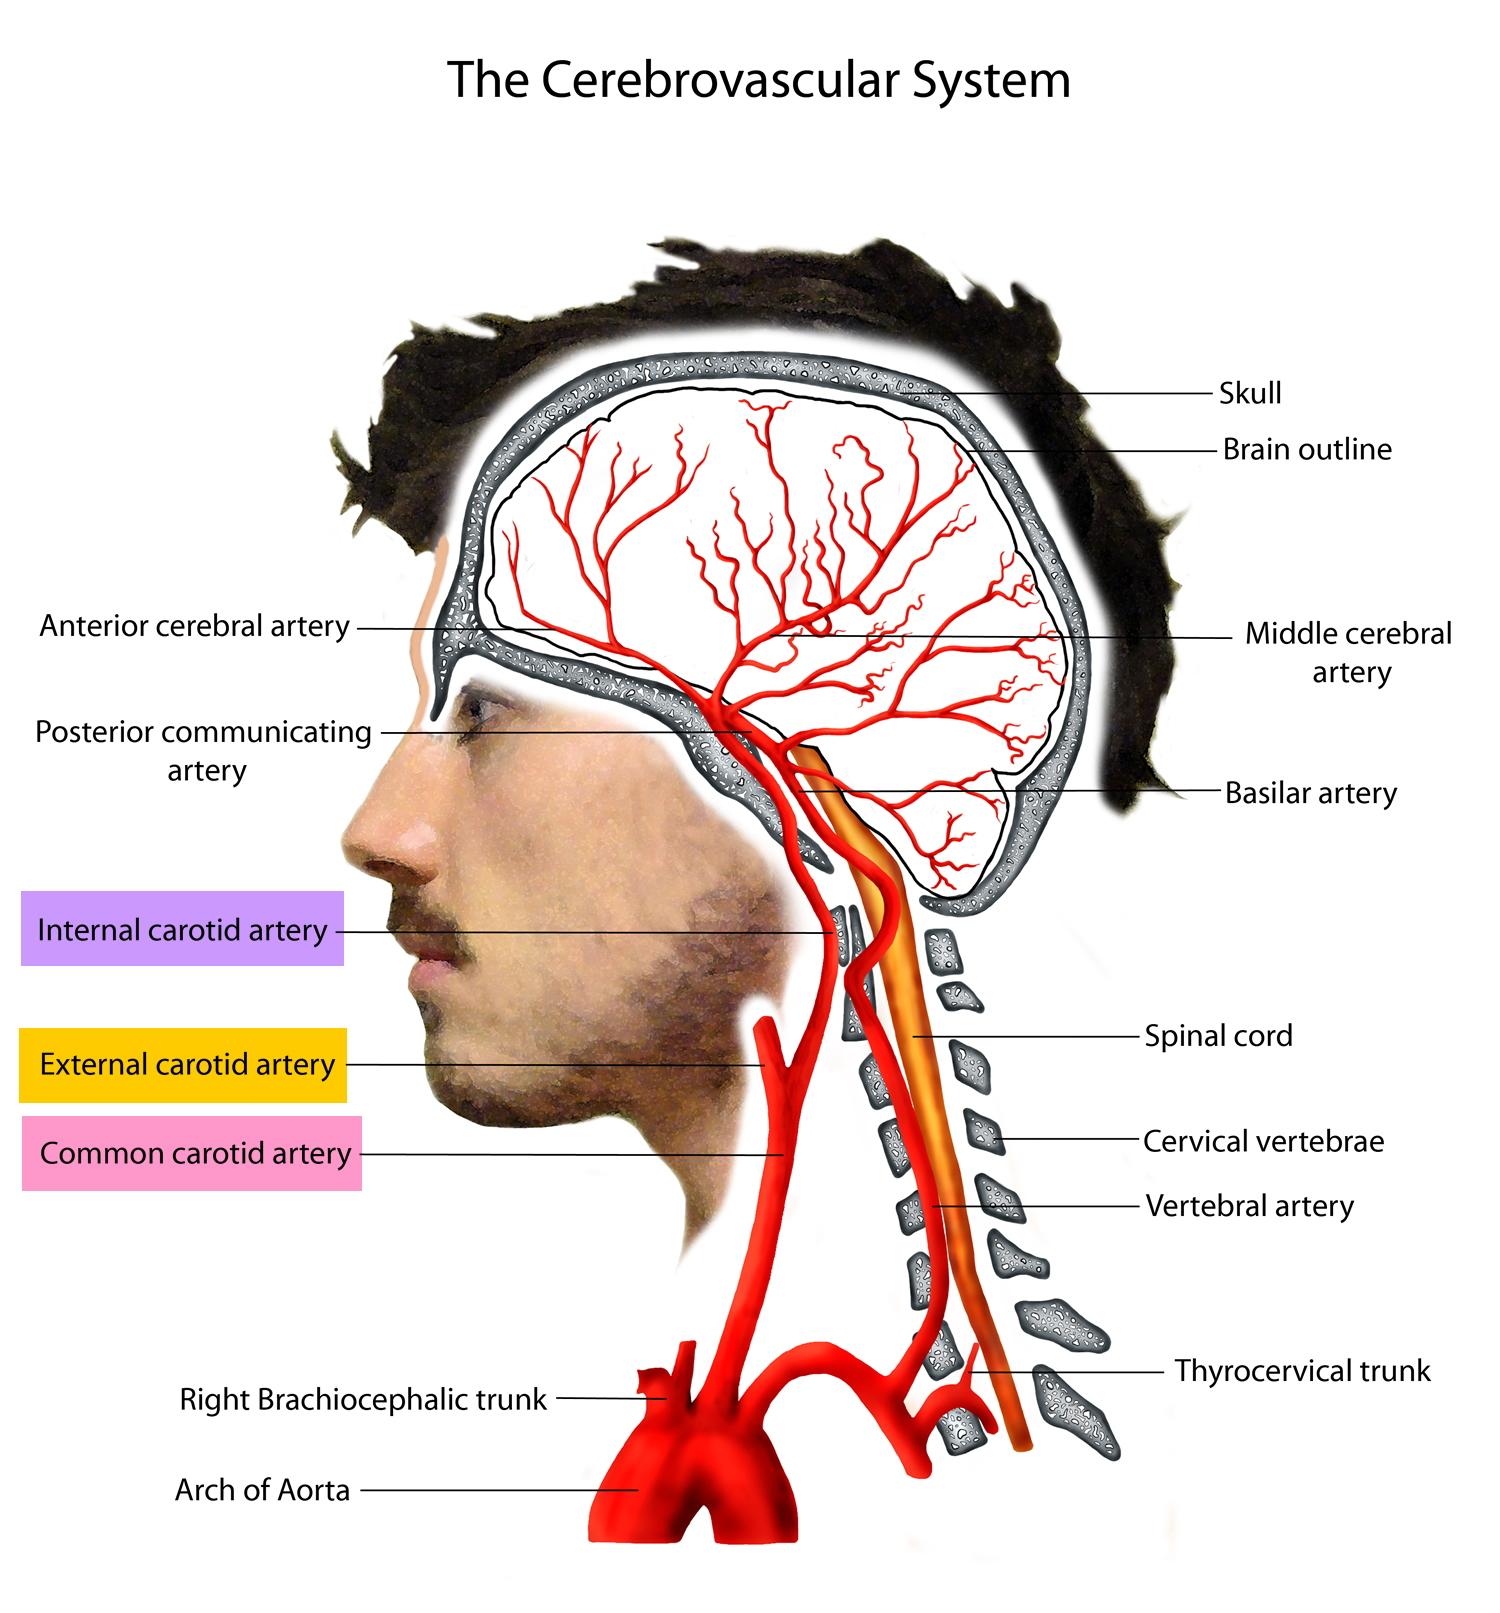 carotid artery diagram wiring dimmer three way switch internal brain frontal lobe usxcleague